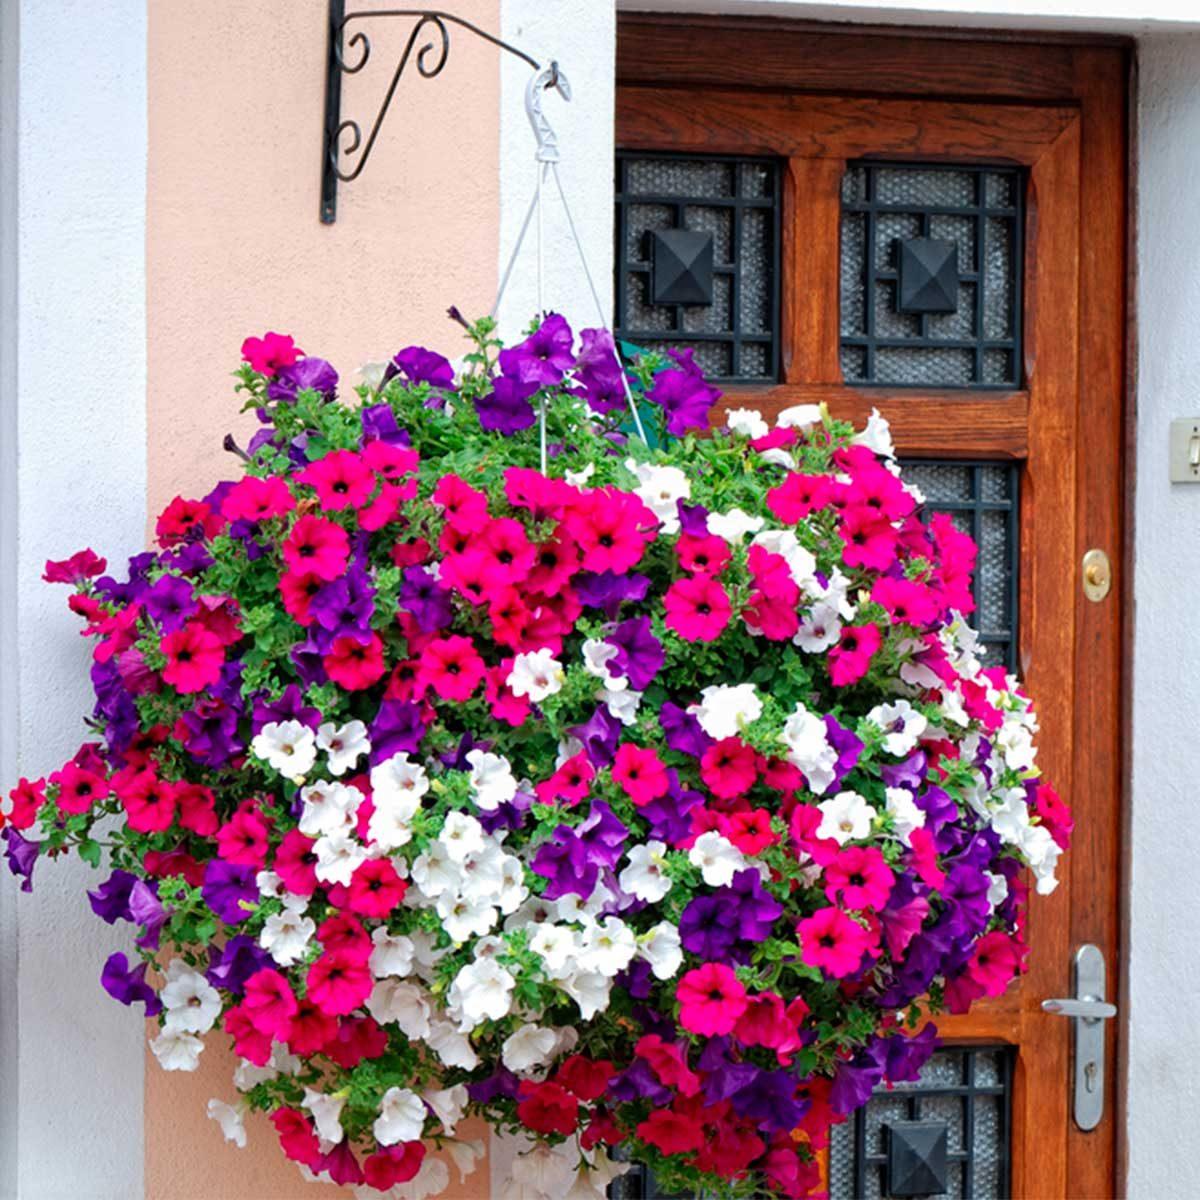 Creative Hanging Planter Ideas   Family Handyman on Plant Hanging Ideas  id=21559